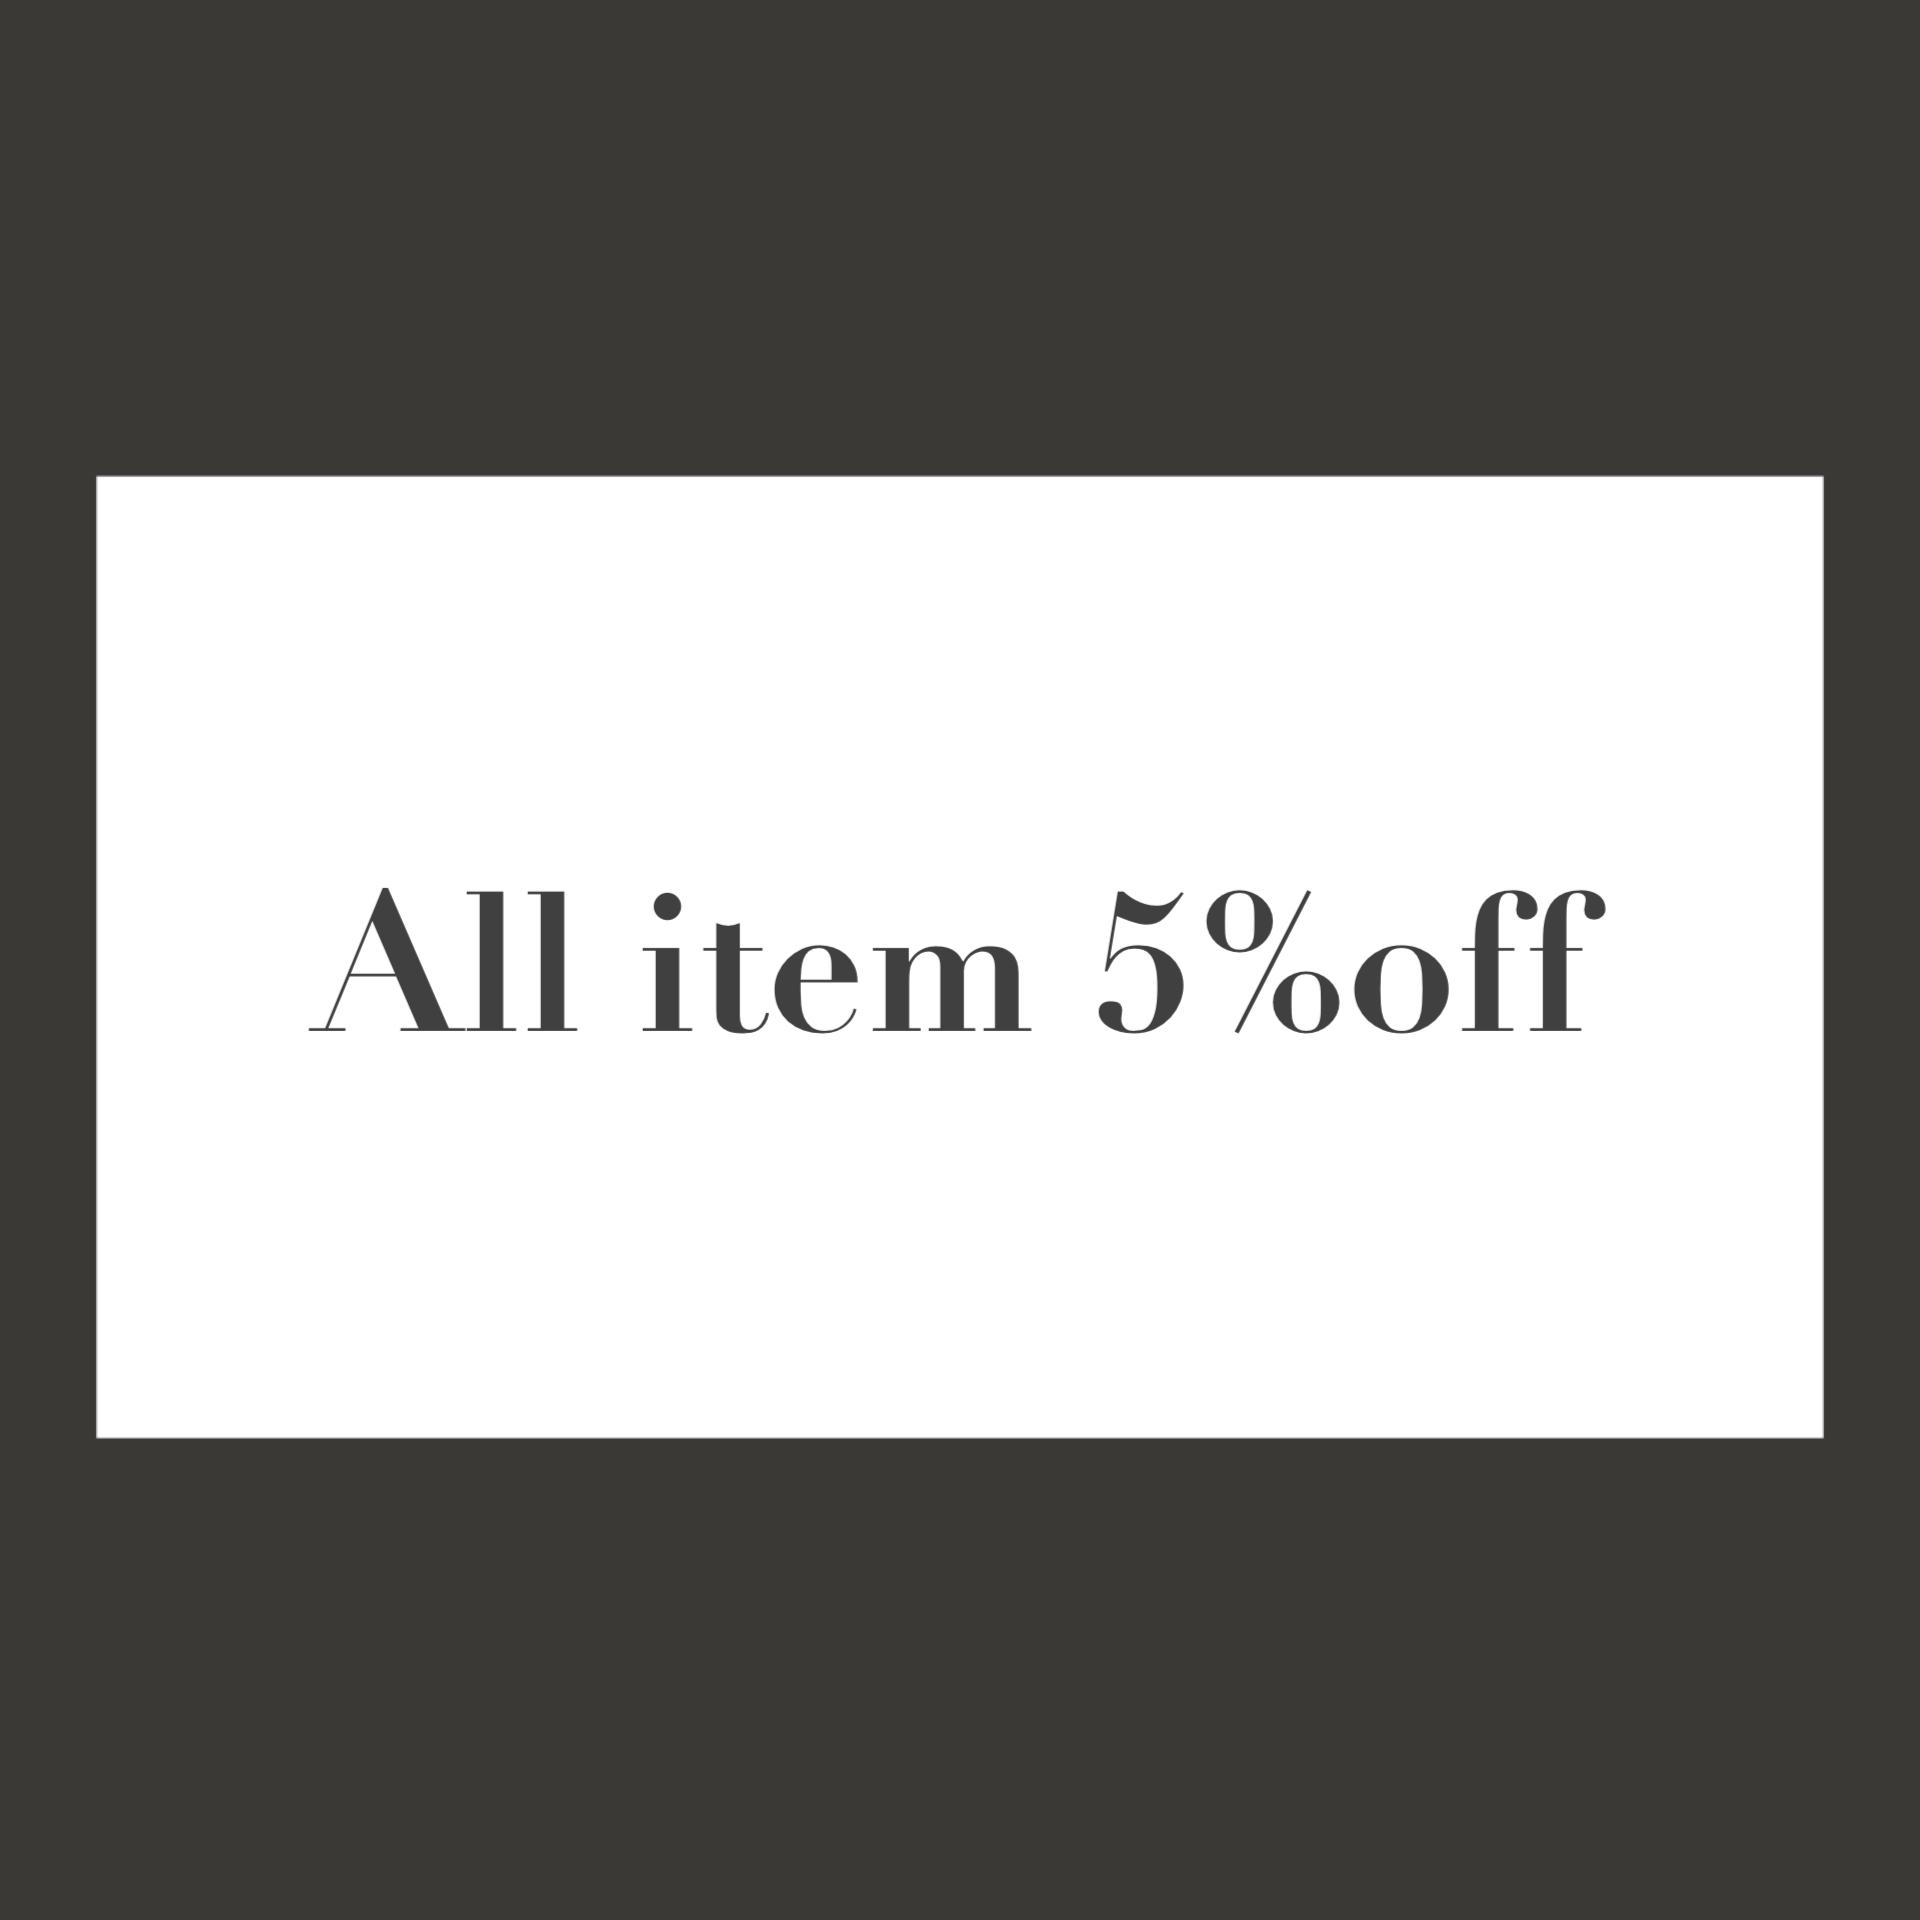 All item 5%off